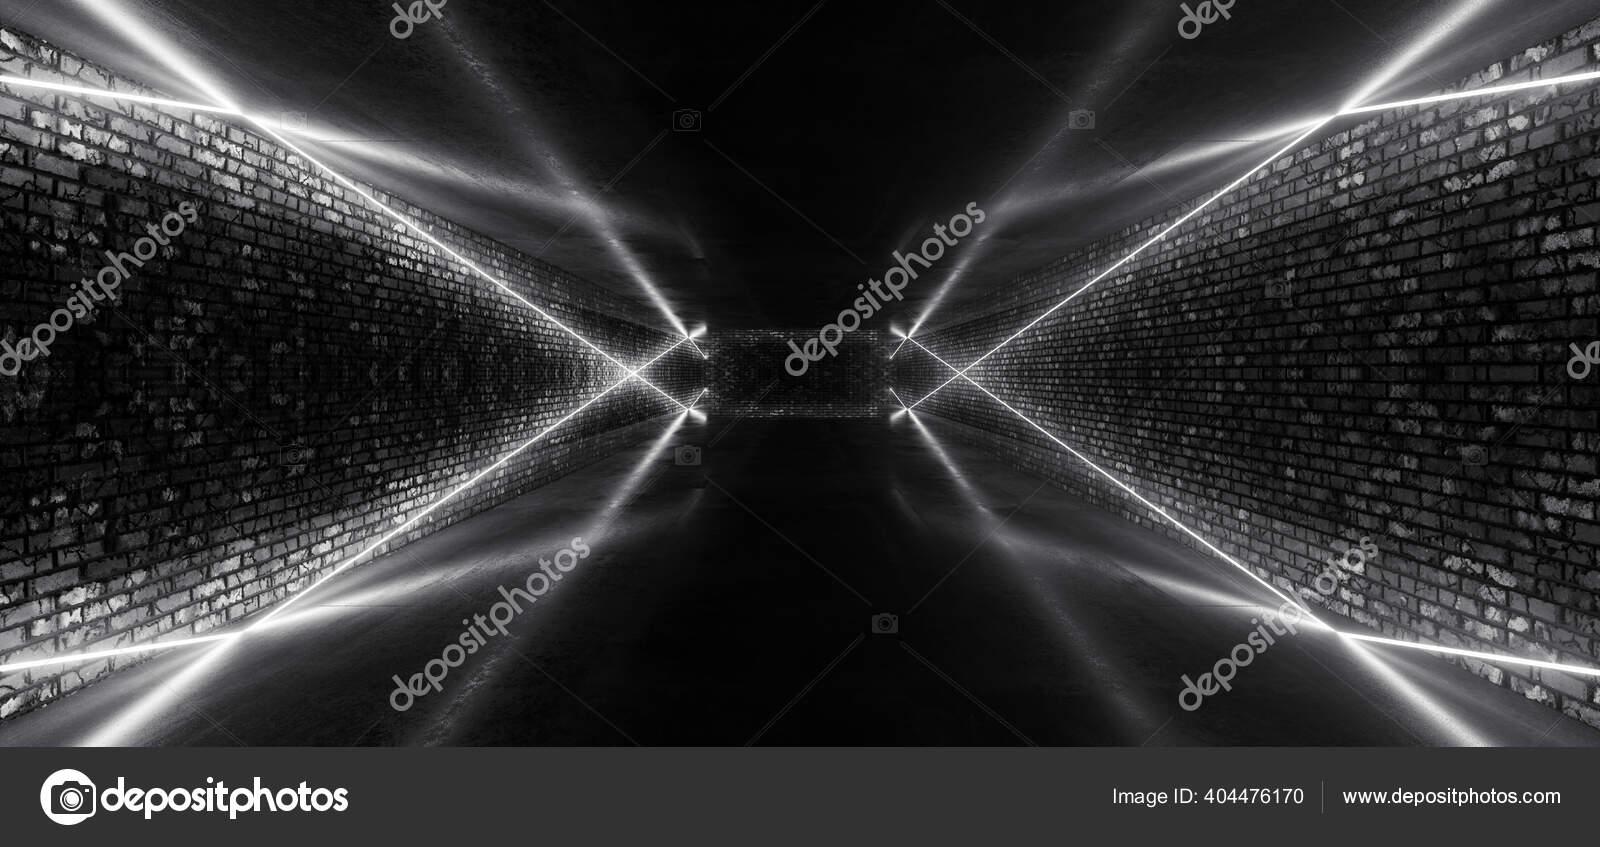 Retro Modern Sci Dance Room Brick Walls Neon Laser Feixes Stock Photo C Ivanmollovphoto 404476170